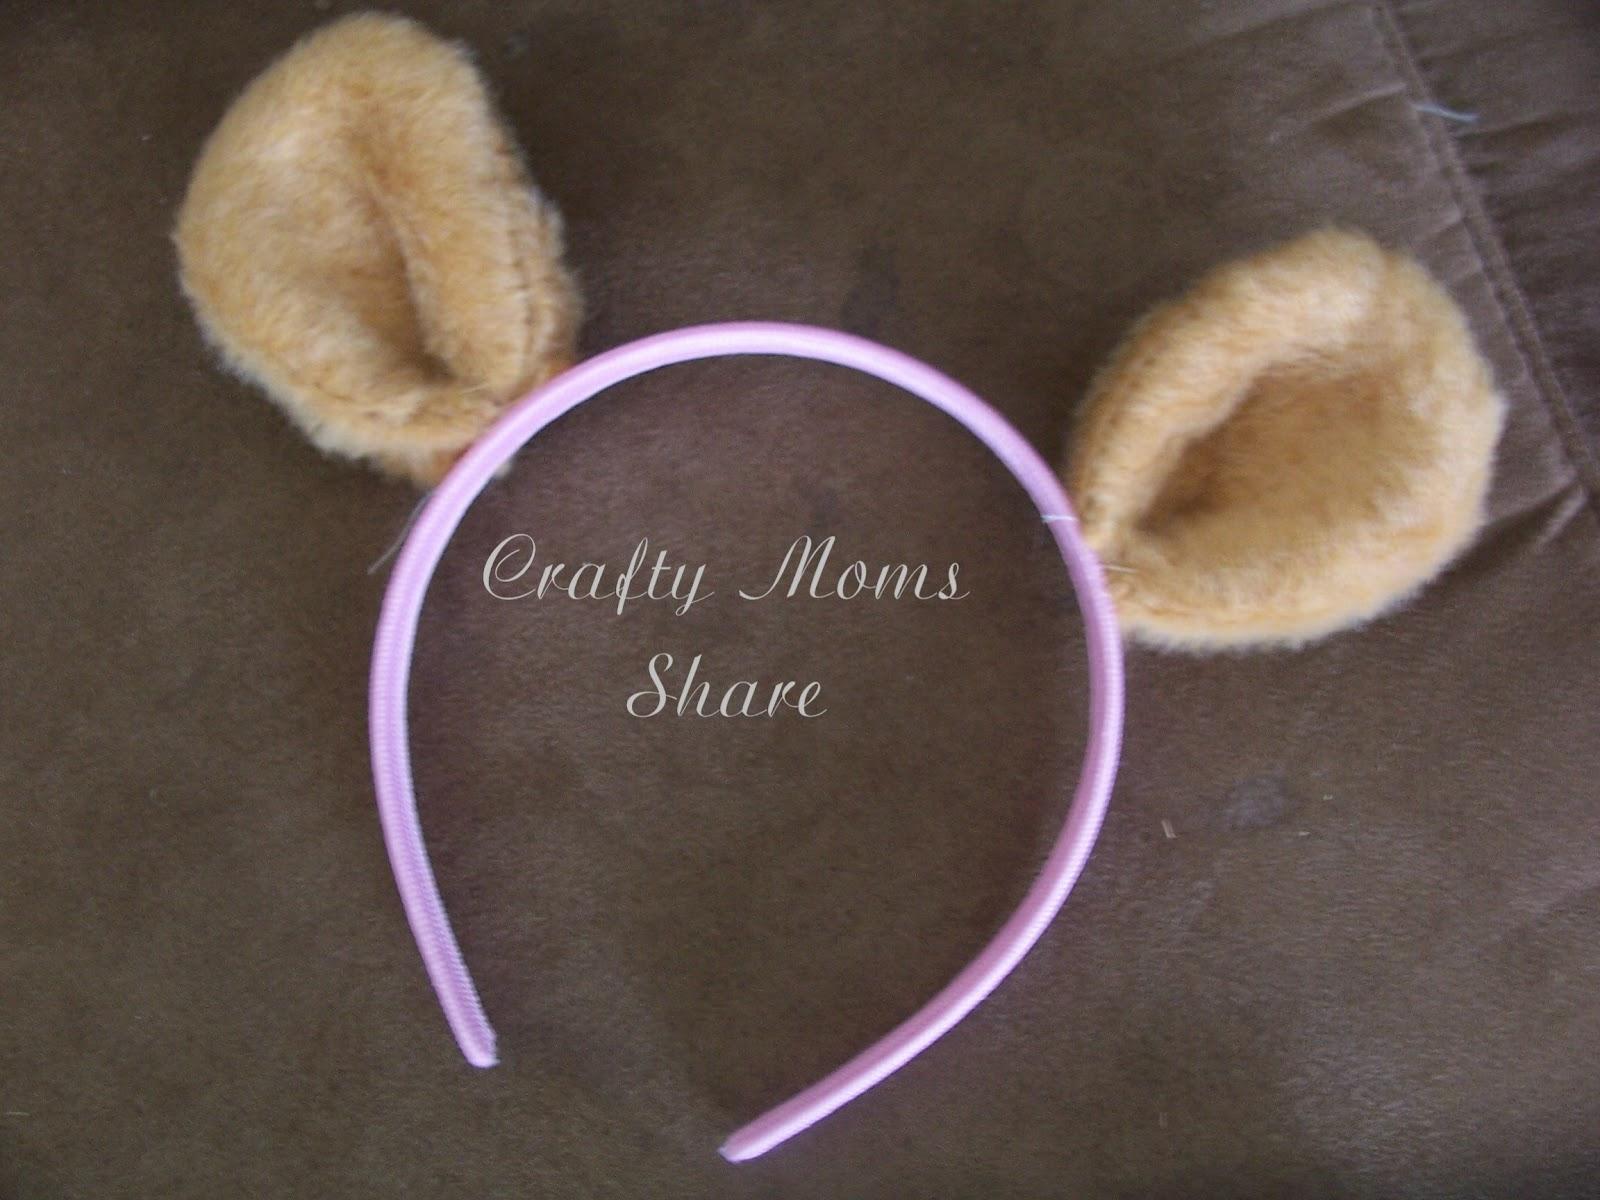 Crafty Moms Share Teddy Bear Ears Teddy Bear Picnic Preparation